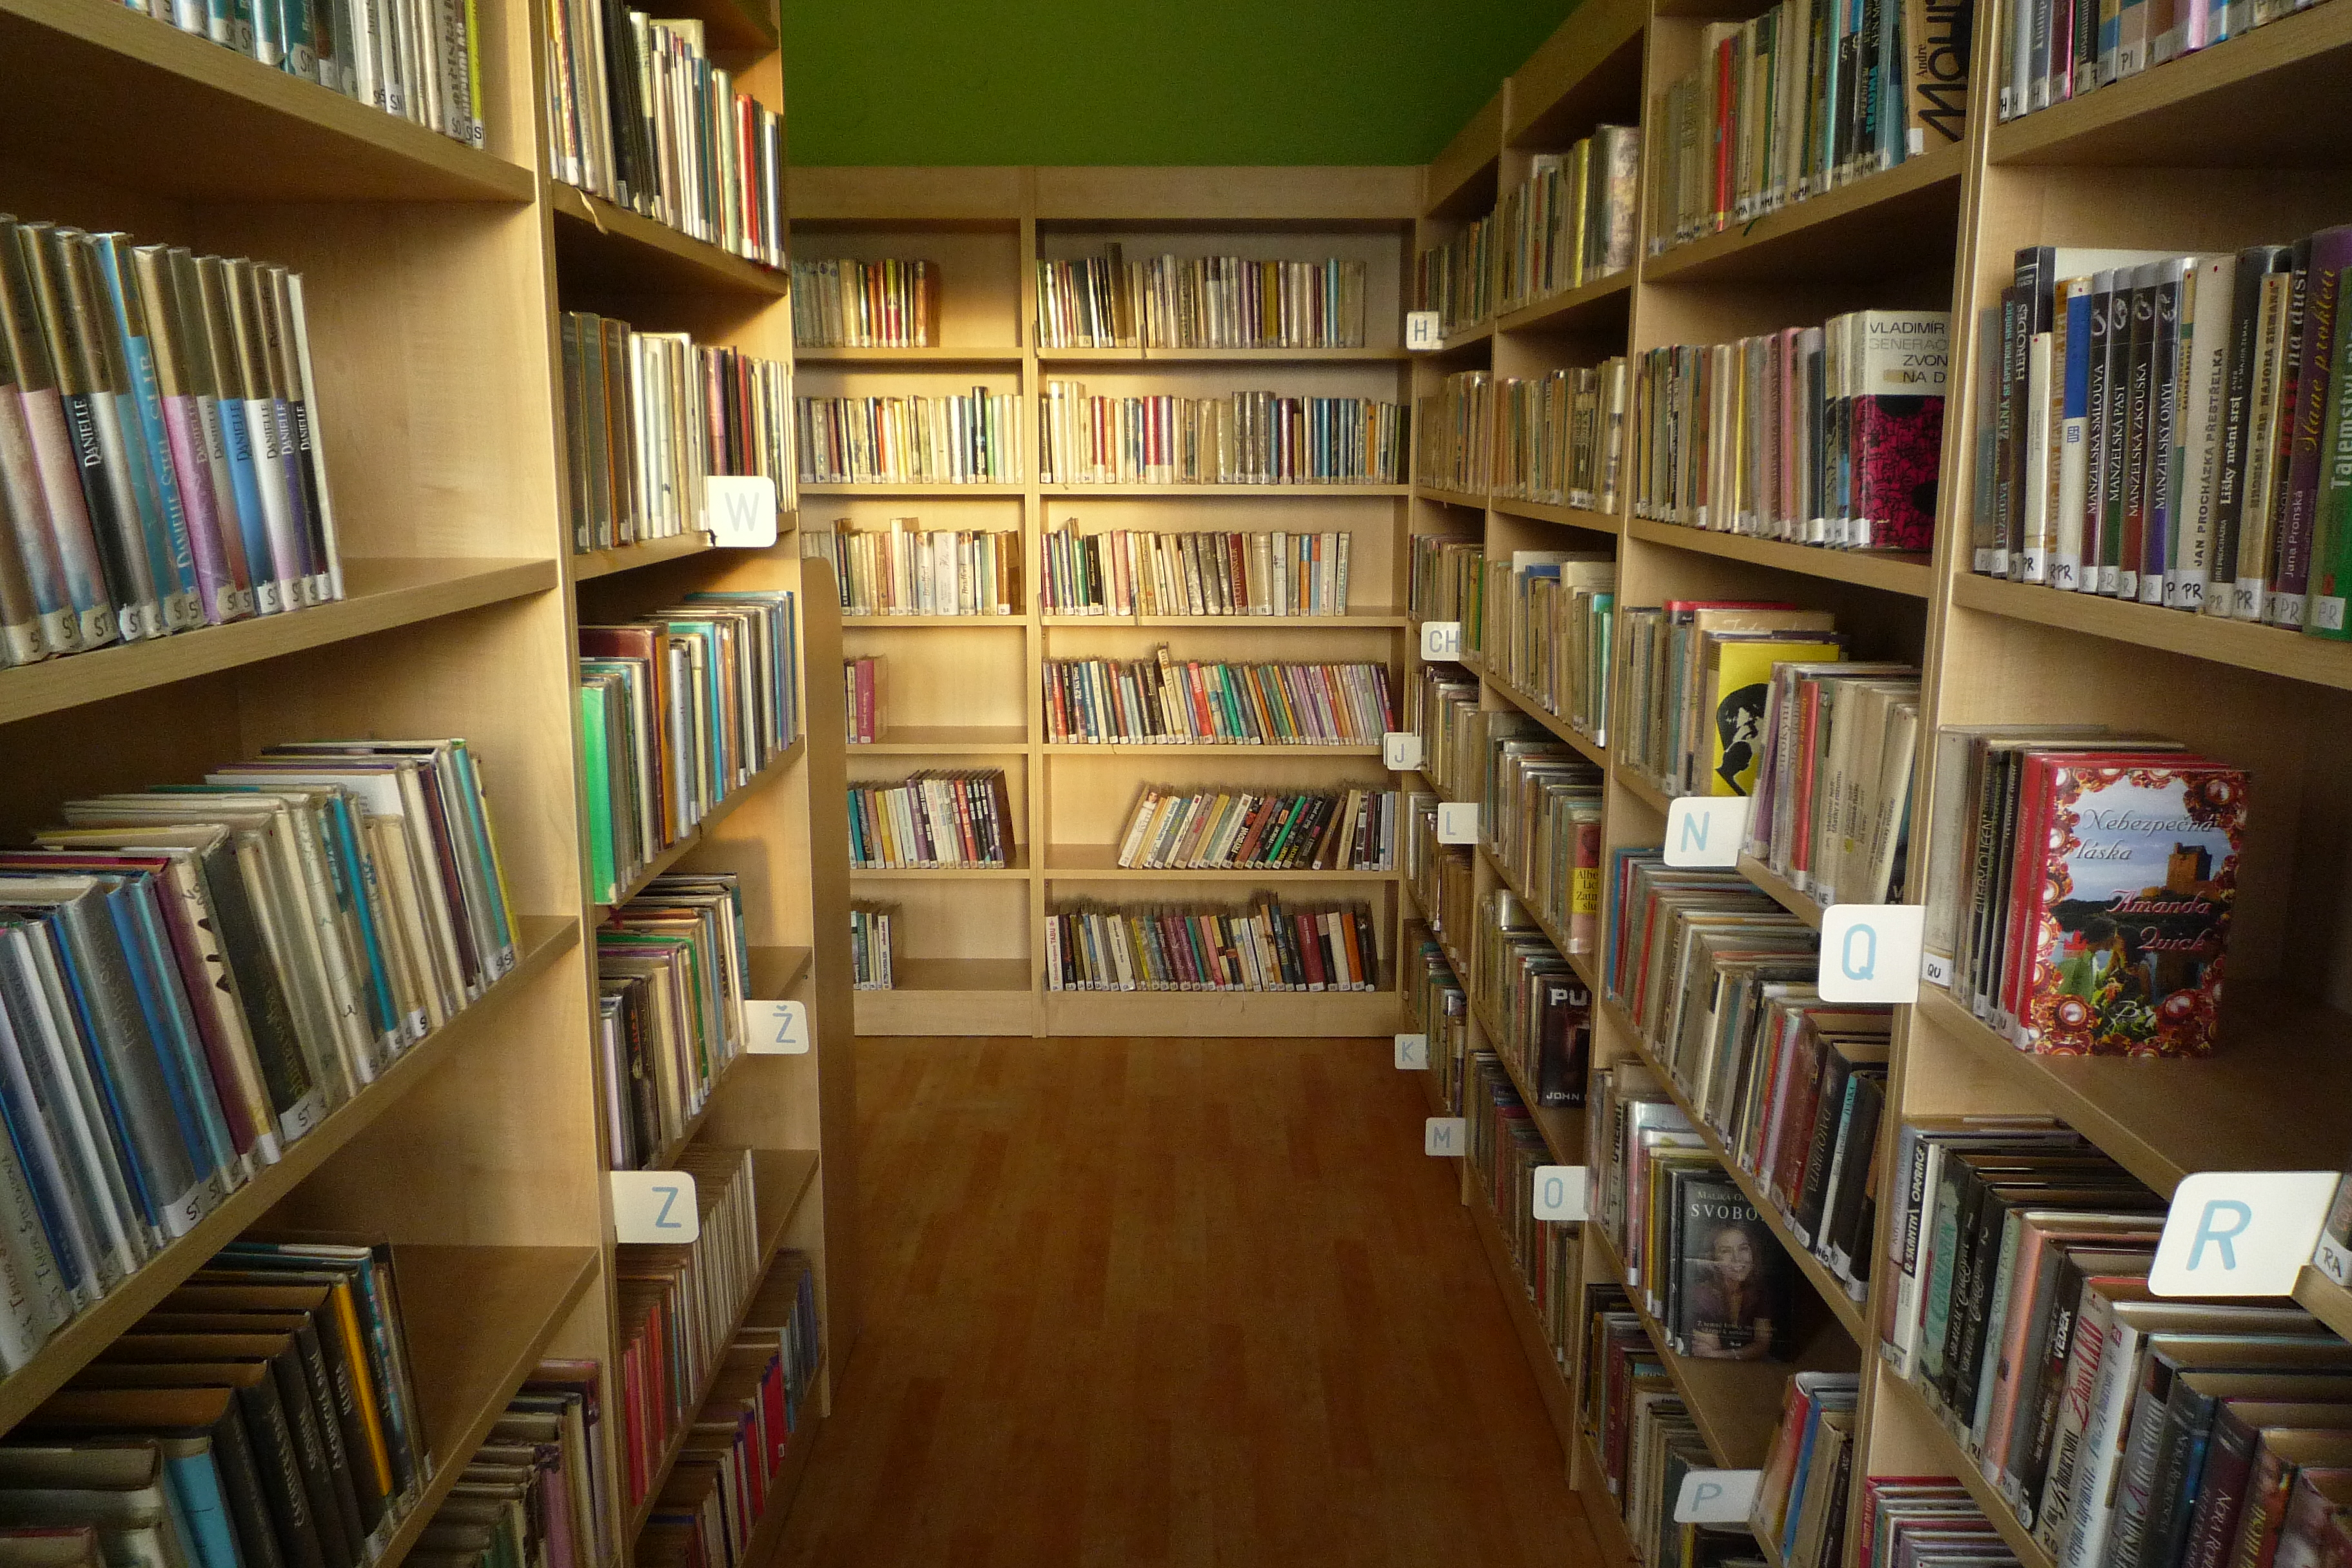 OBRÁZEK : rekonstrukce_knihovny_2016_5.jpg